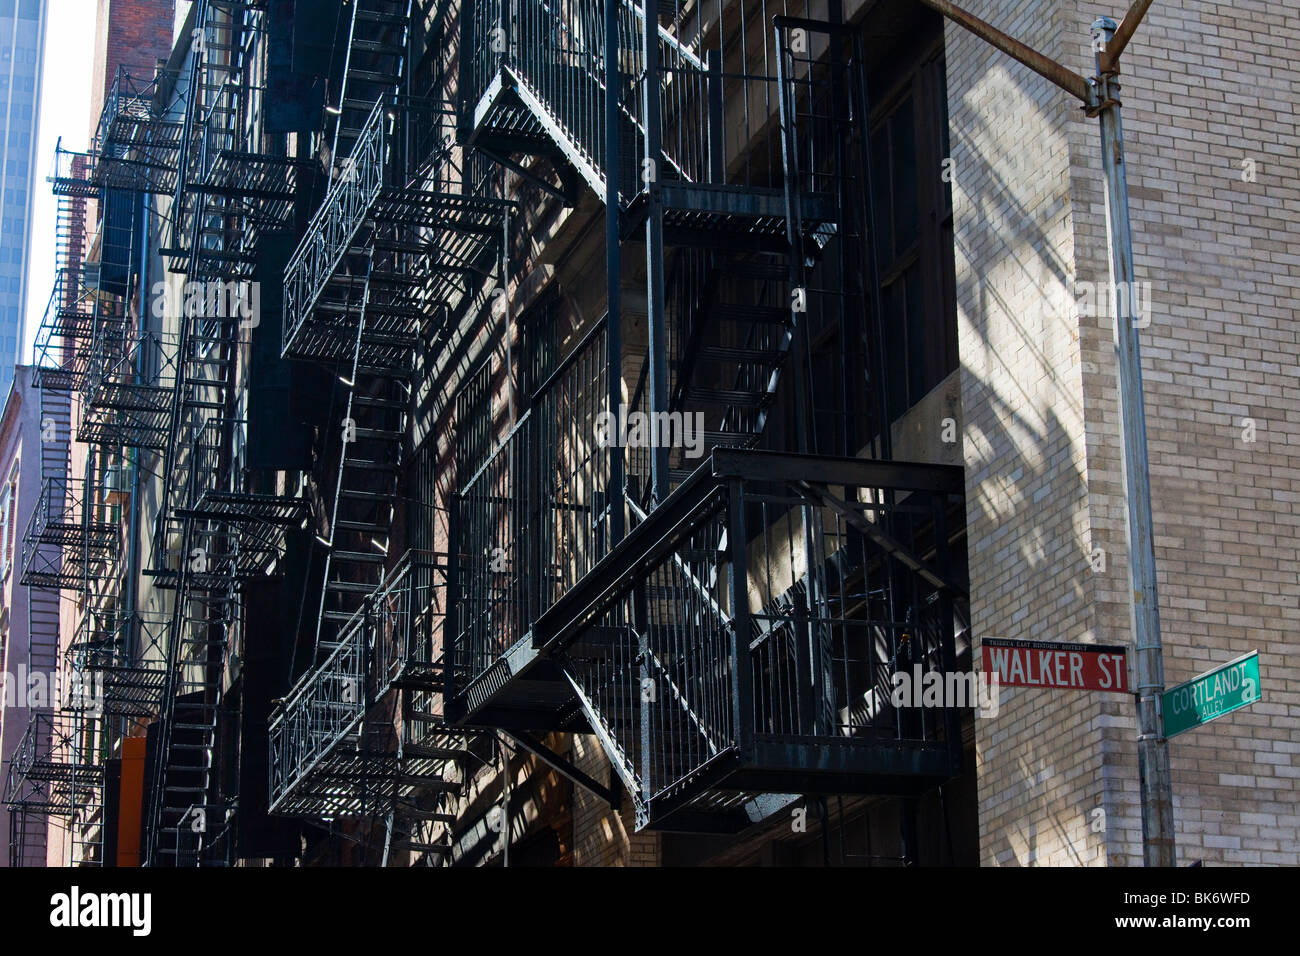 Cortlandt Alley in Tribeca, Manahattan, New York Stock Photo